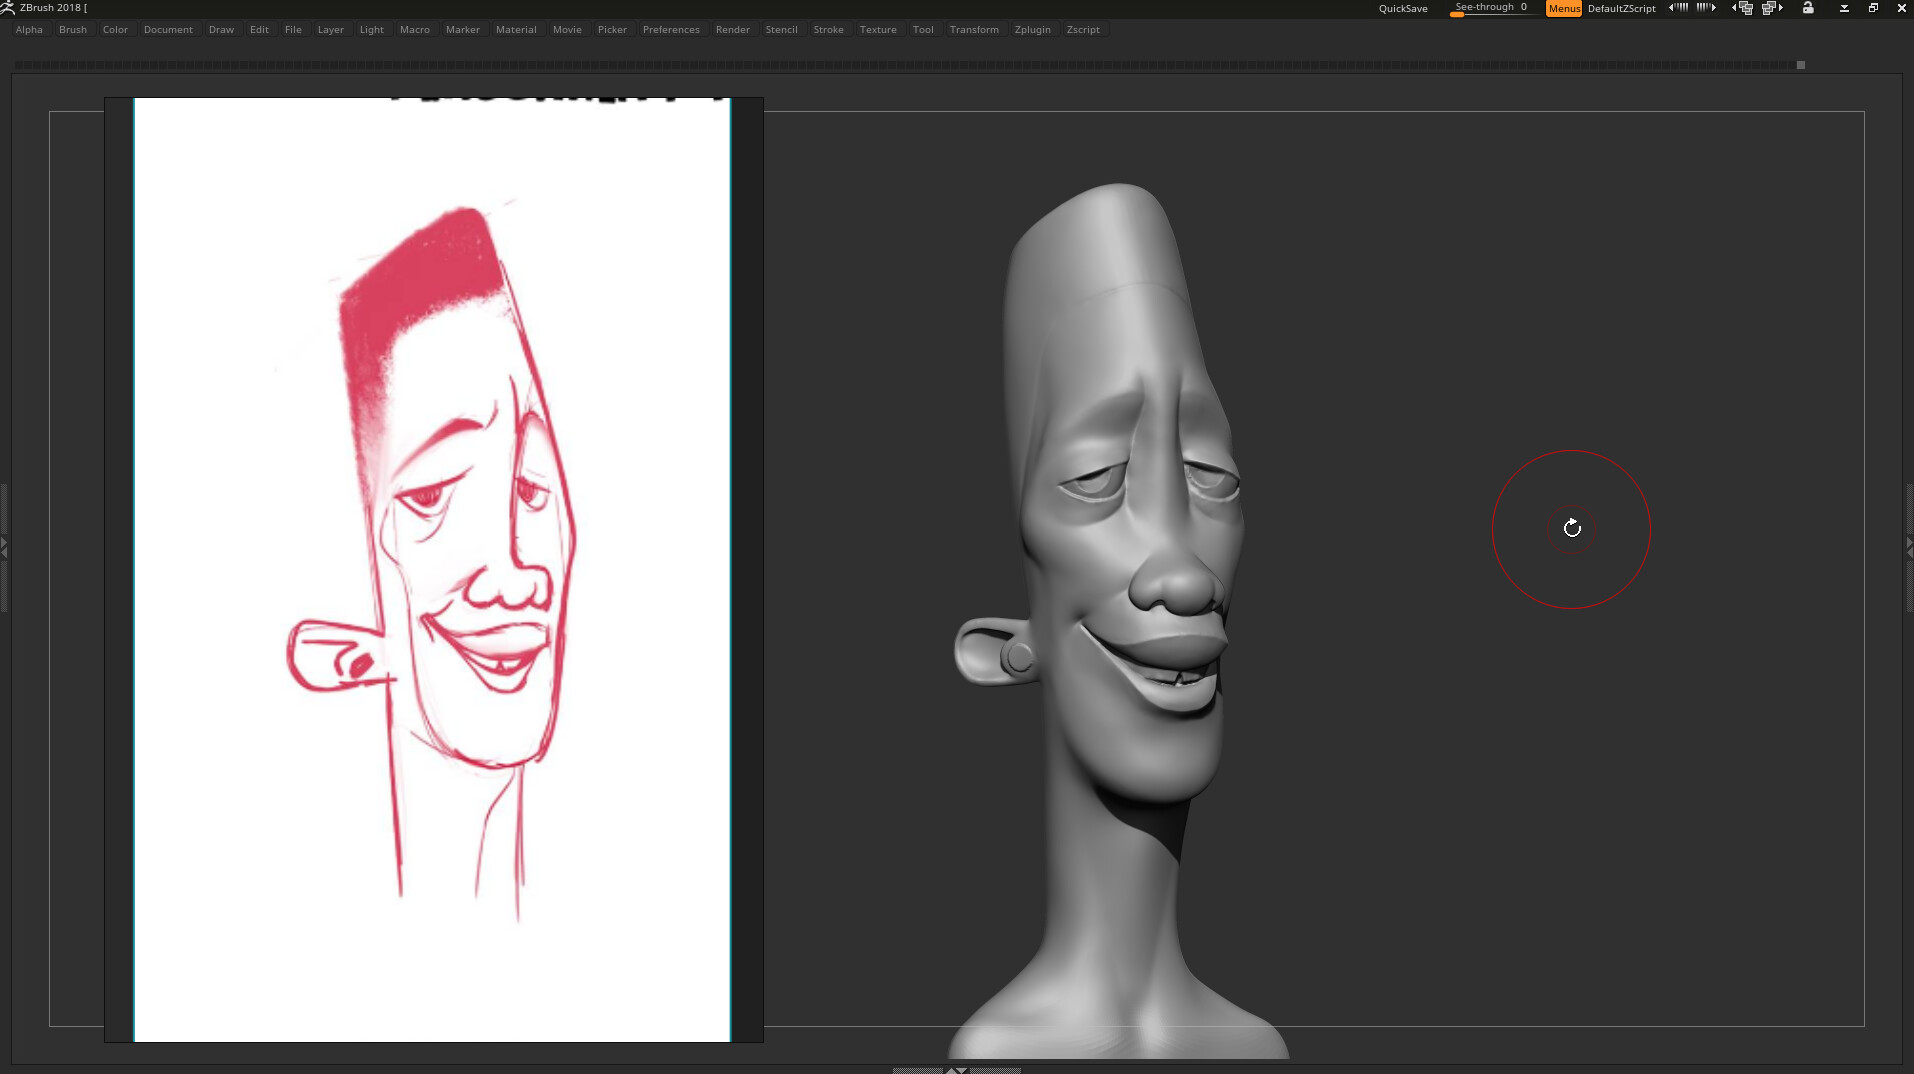 Katan's Concept / My Zbrush sketch